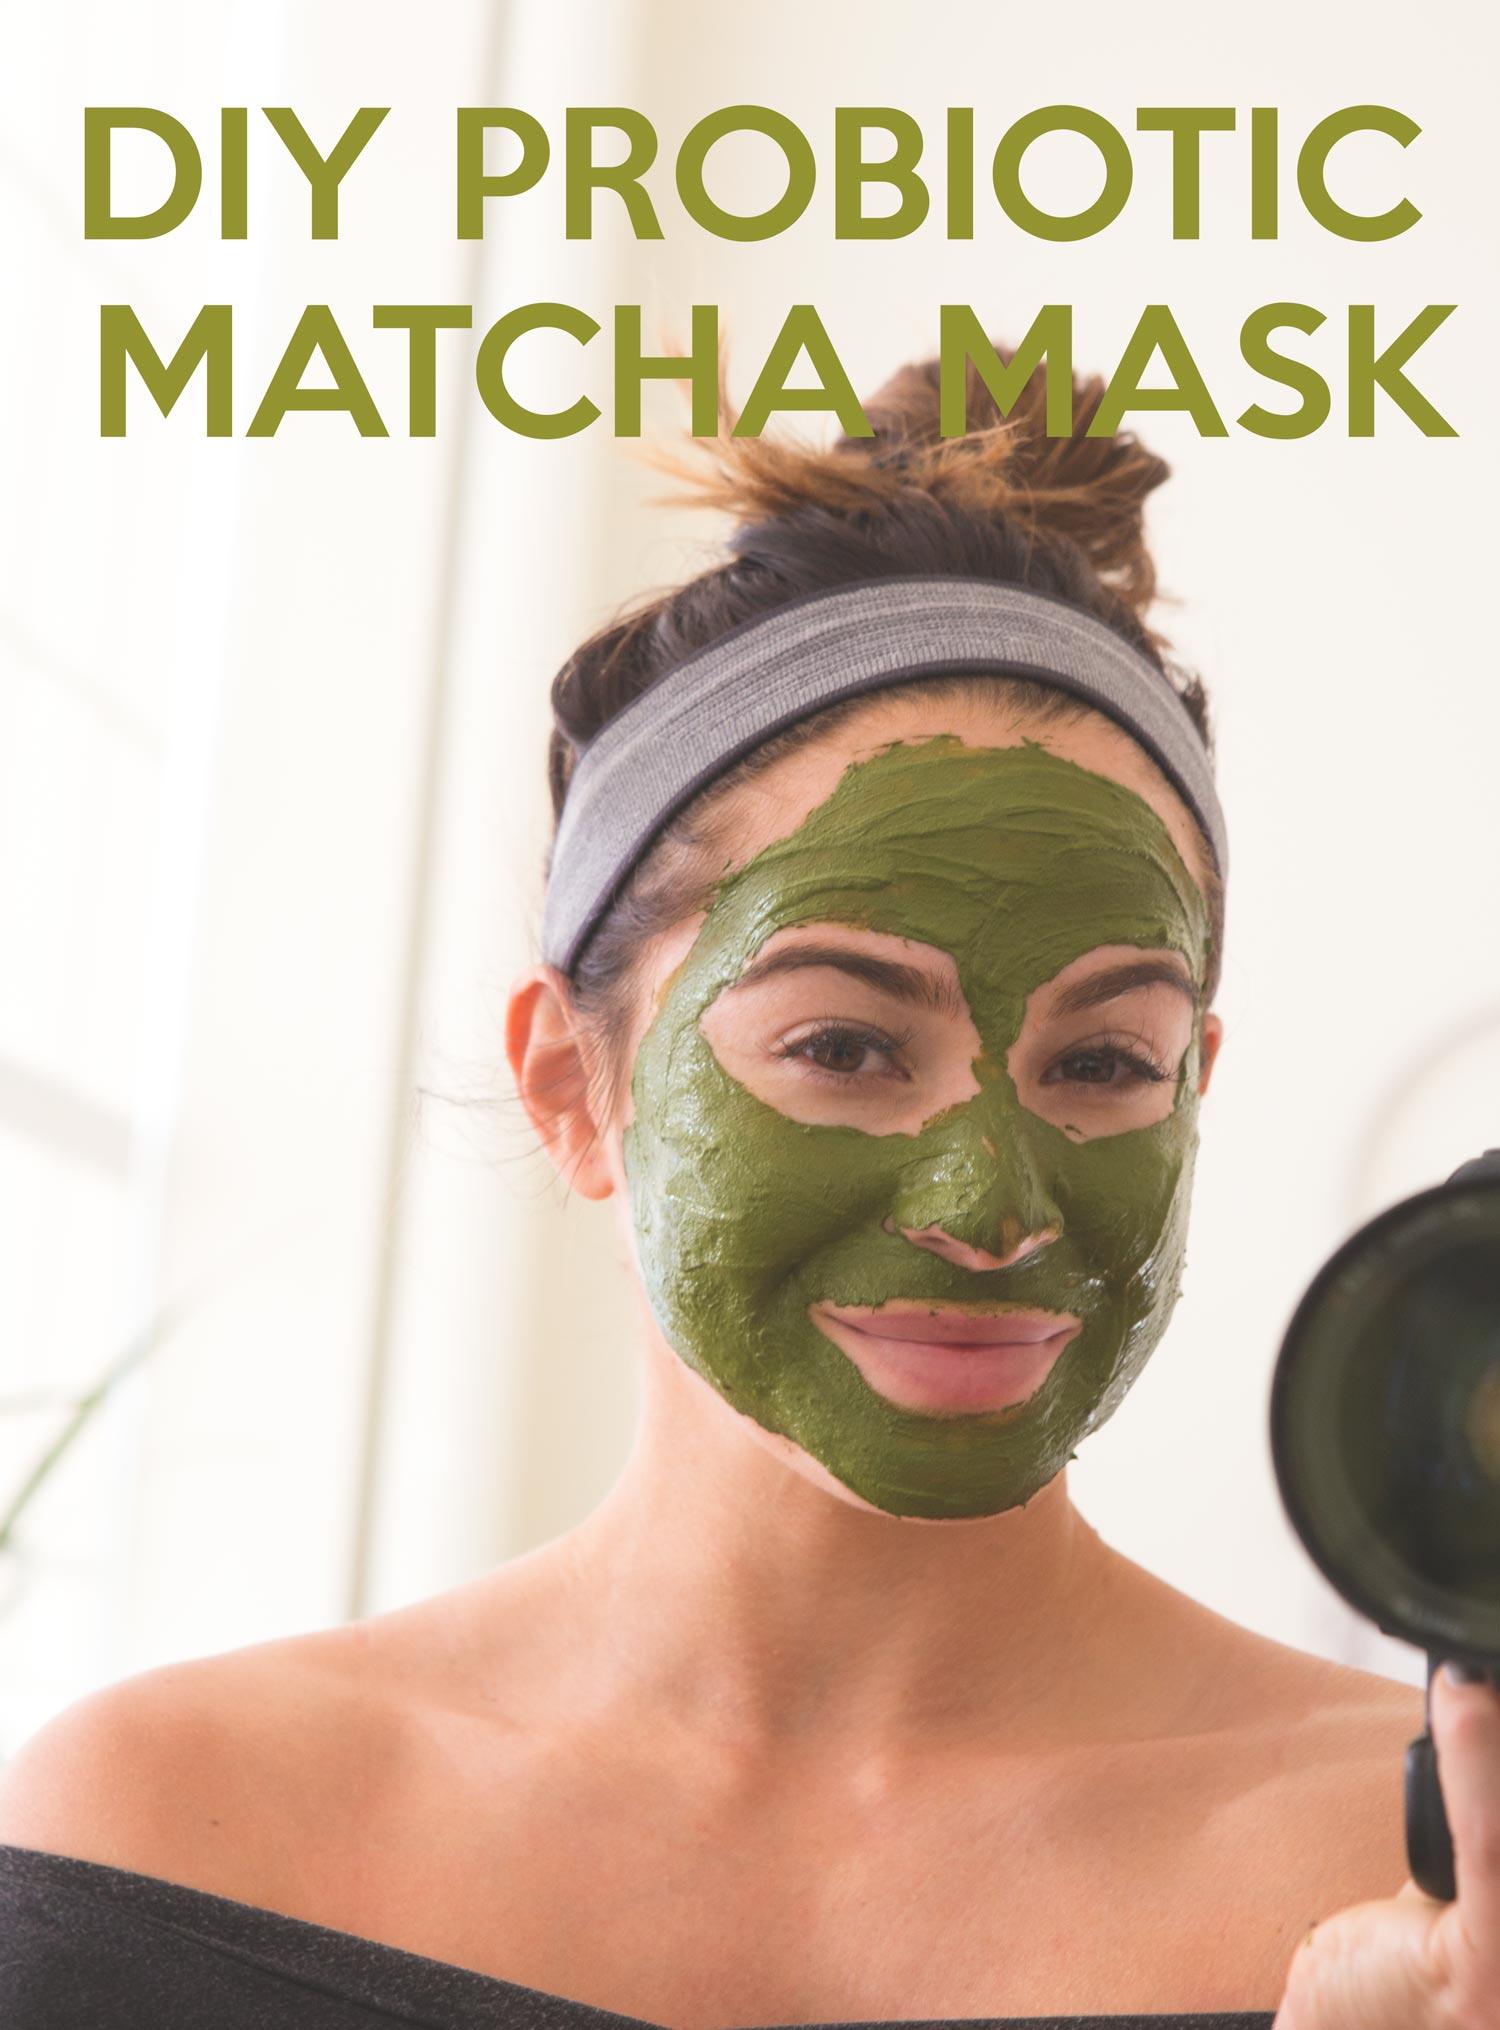 Pin it! DIY Probiotic Matcha Mask